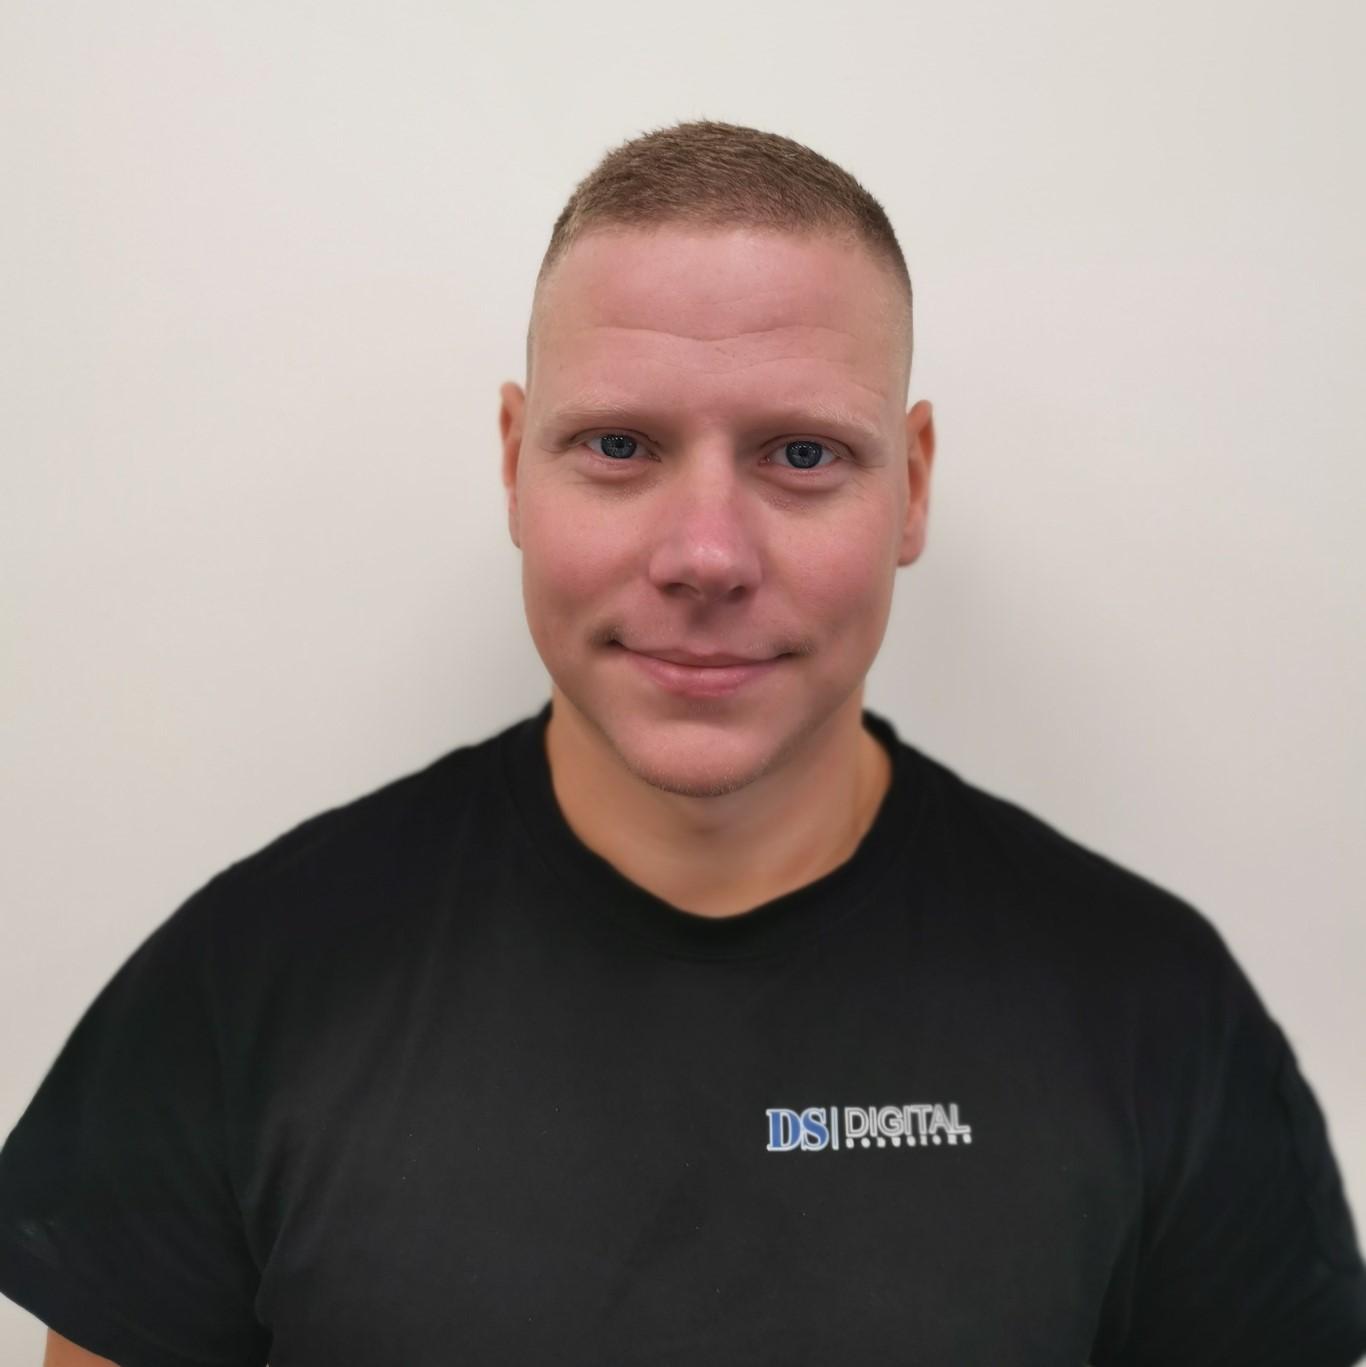 DS Jonas Eskilsson